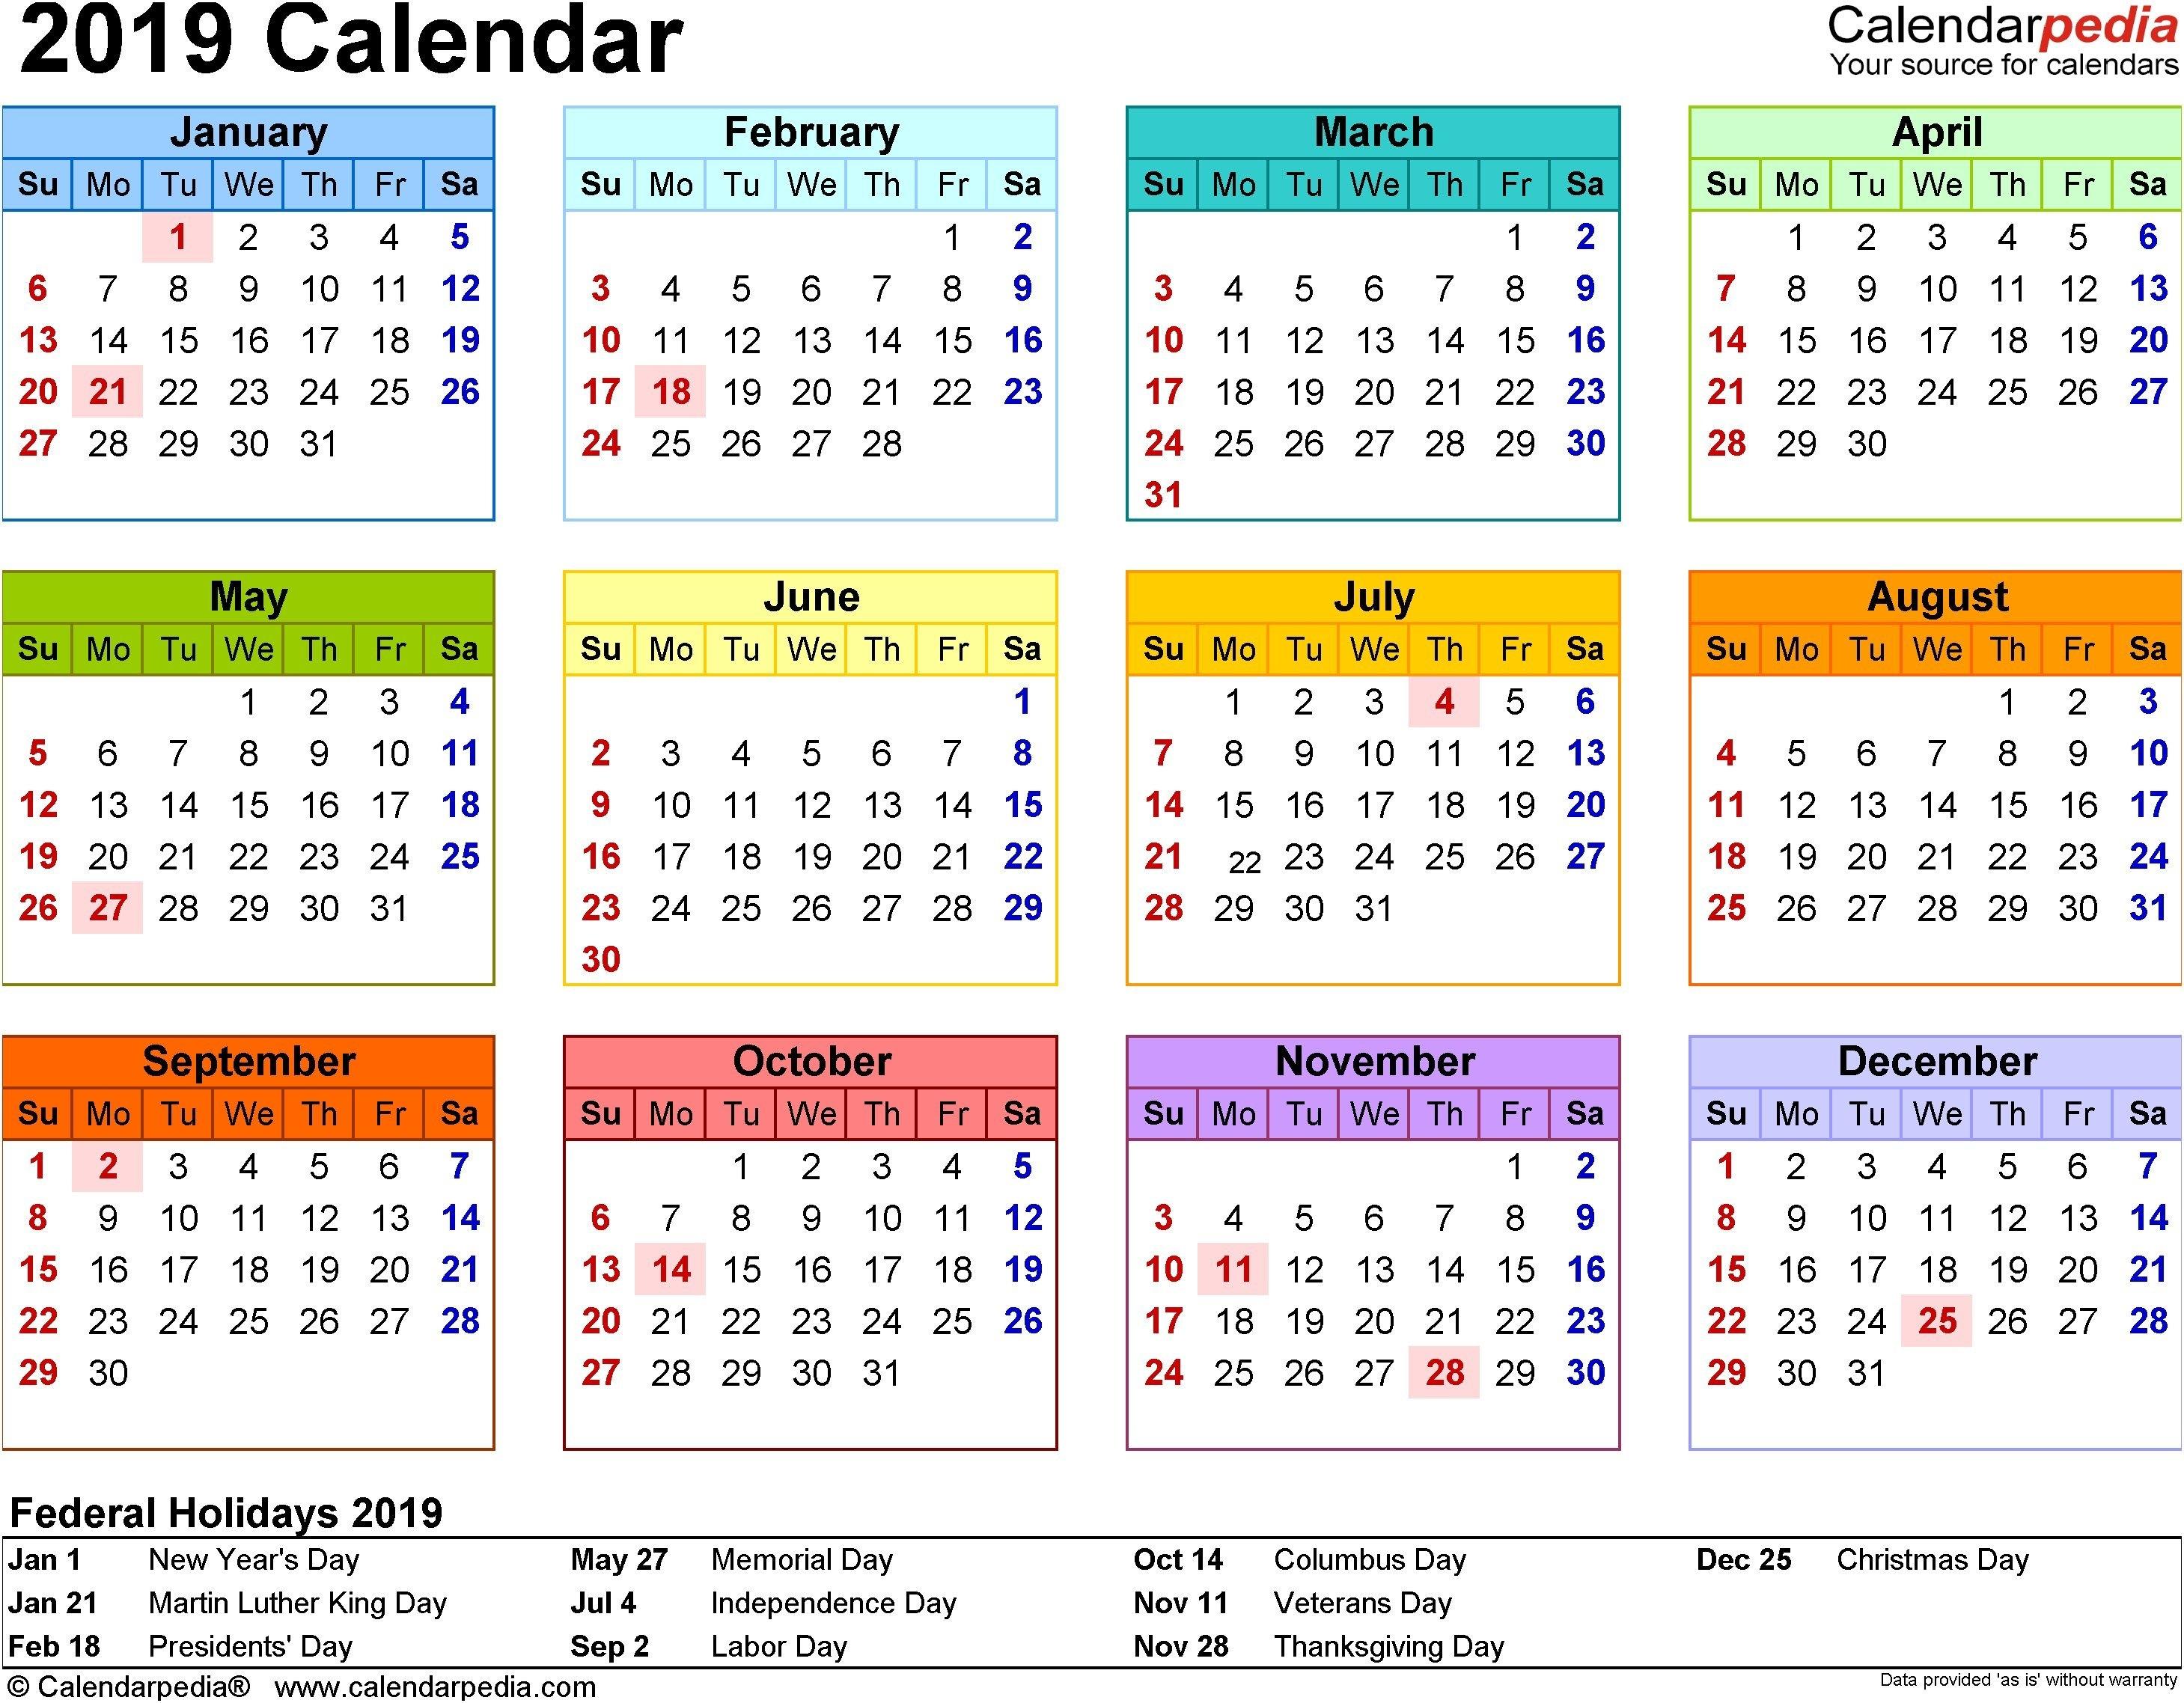 2019 Ka Calendar To Download Or Print | Americanwomanmag 2019 Ka Calendar